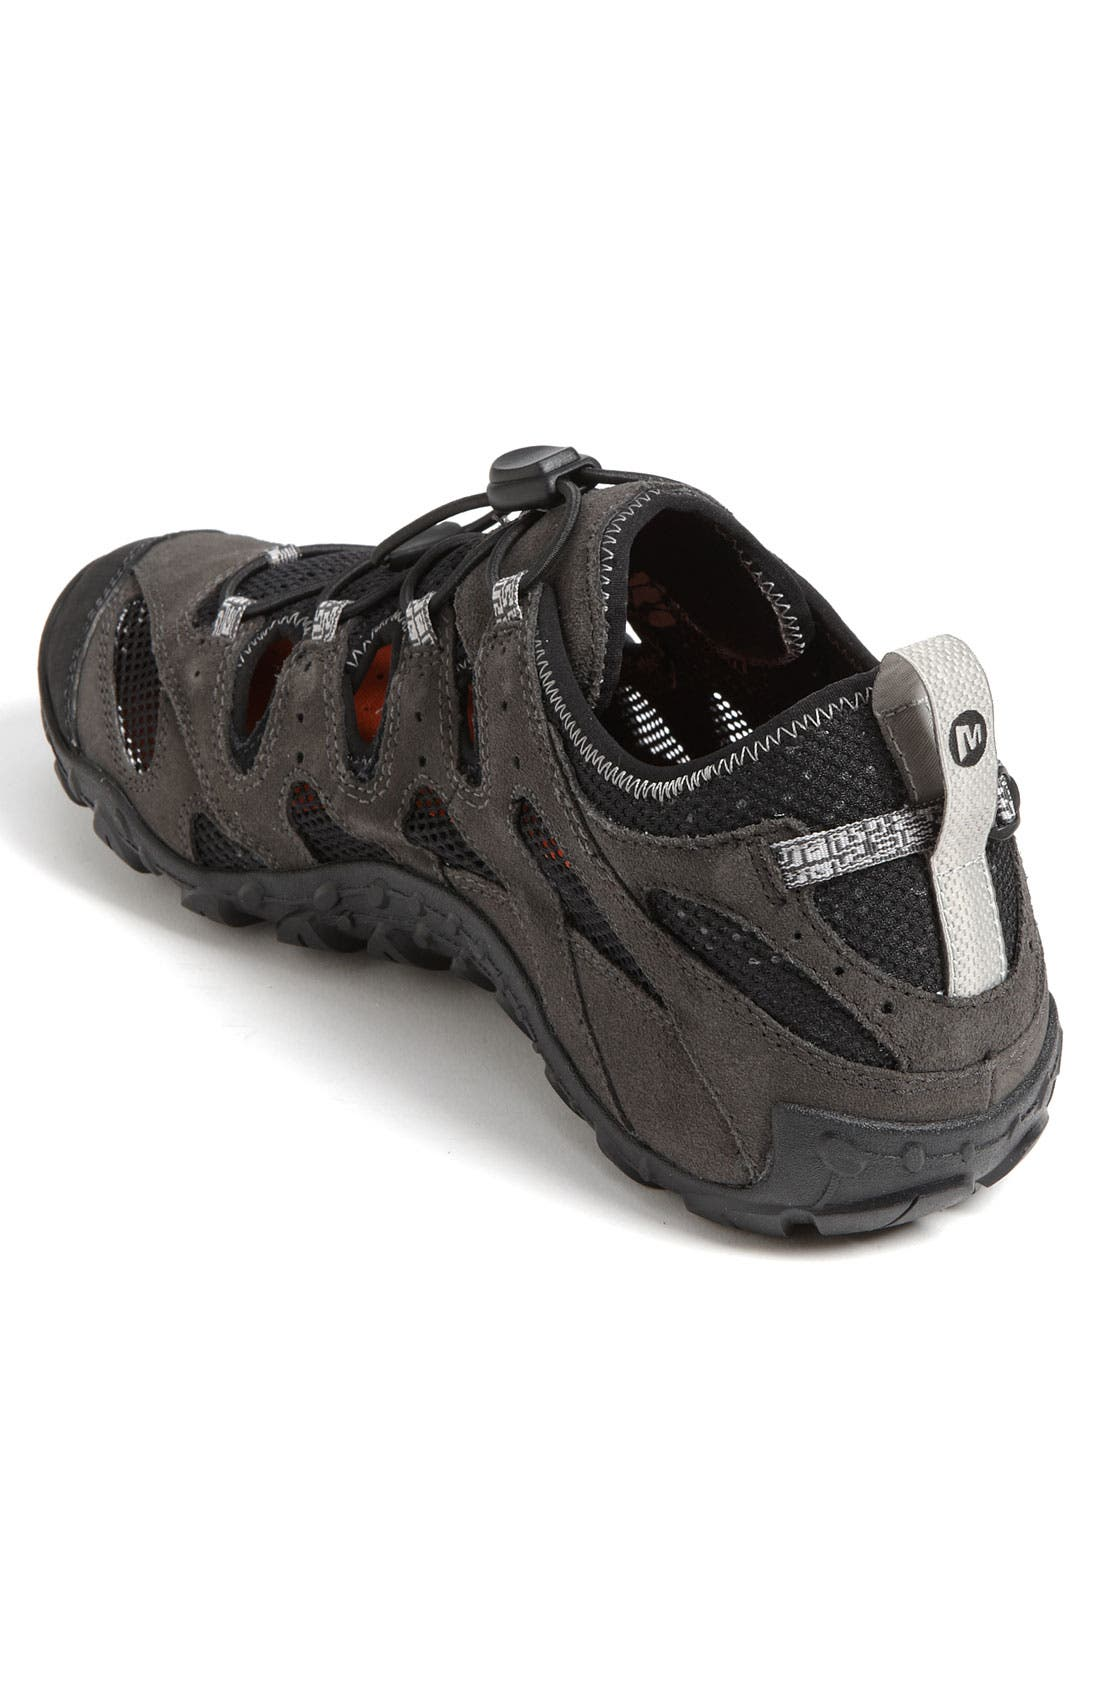 Alternate Image 2  - Merrell 'Chameleon Cyclone' Hiking Shoe (Men)